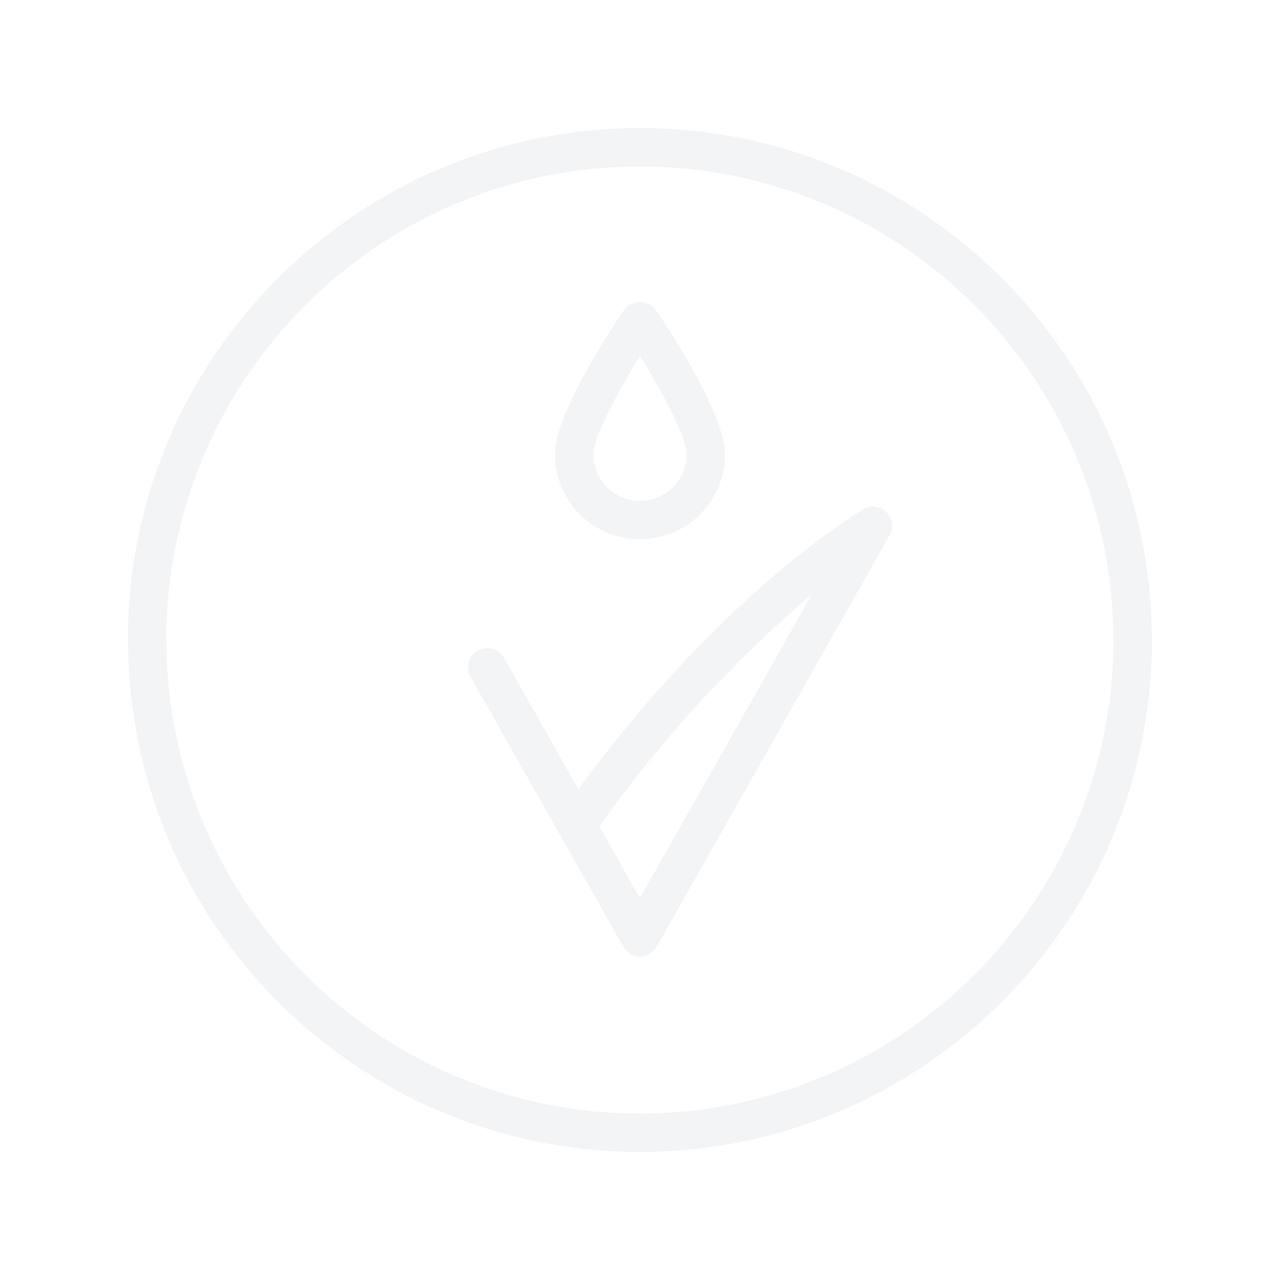 SCHWARZKOPF PROFESSIONAL Blond Me Keratin Restore Bonding Mask 200ml